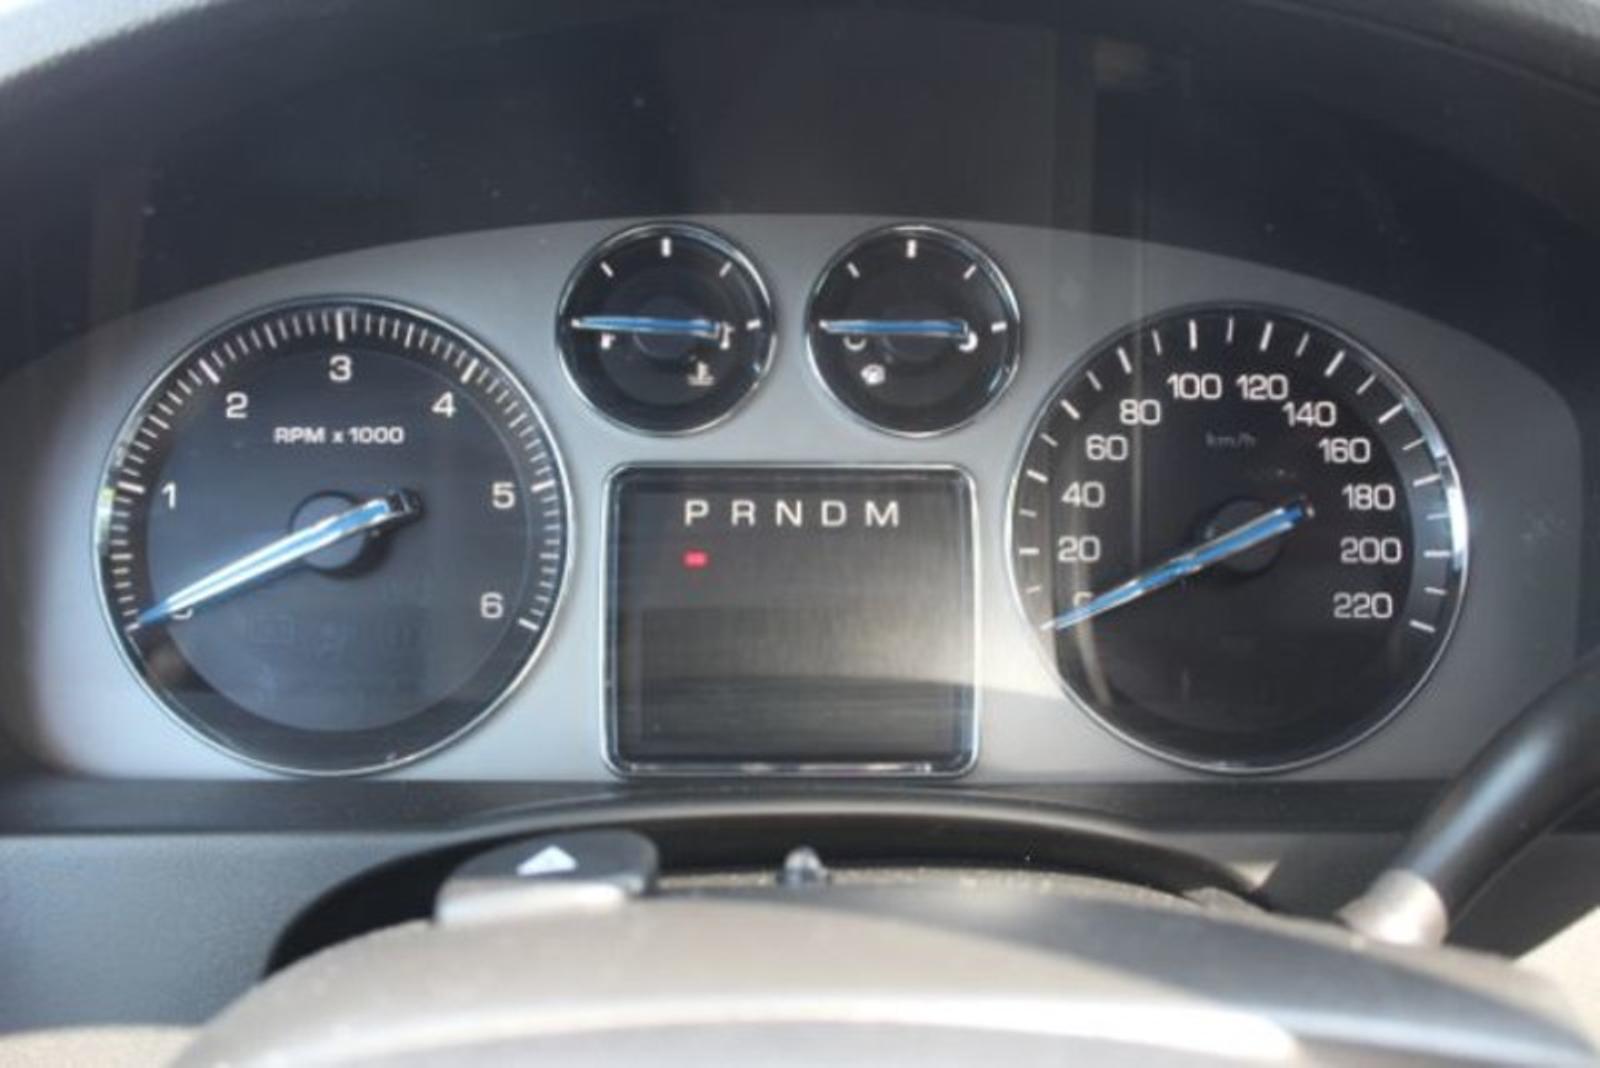 Tachometer Wiring For 2003 Escalade Trusted Diagram 2008 Cadillac Esv City Mt Bleskin Motor Company Vdo